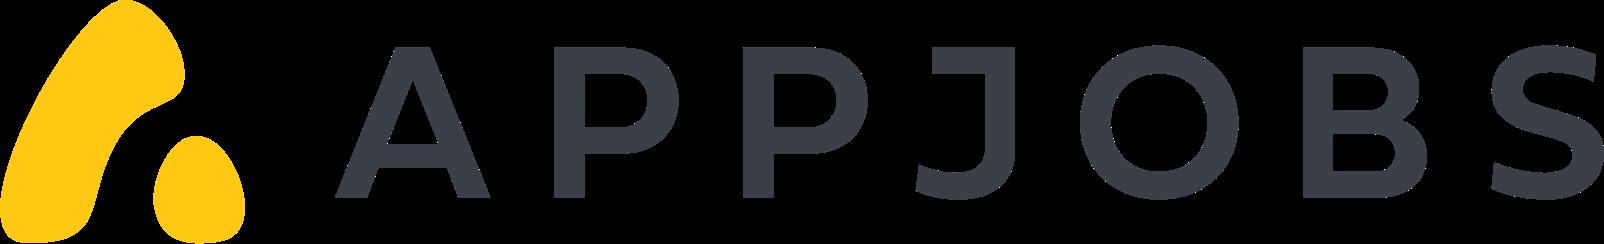 Appjobs logo